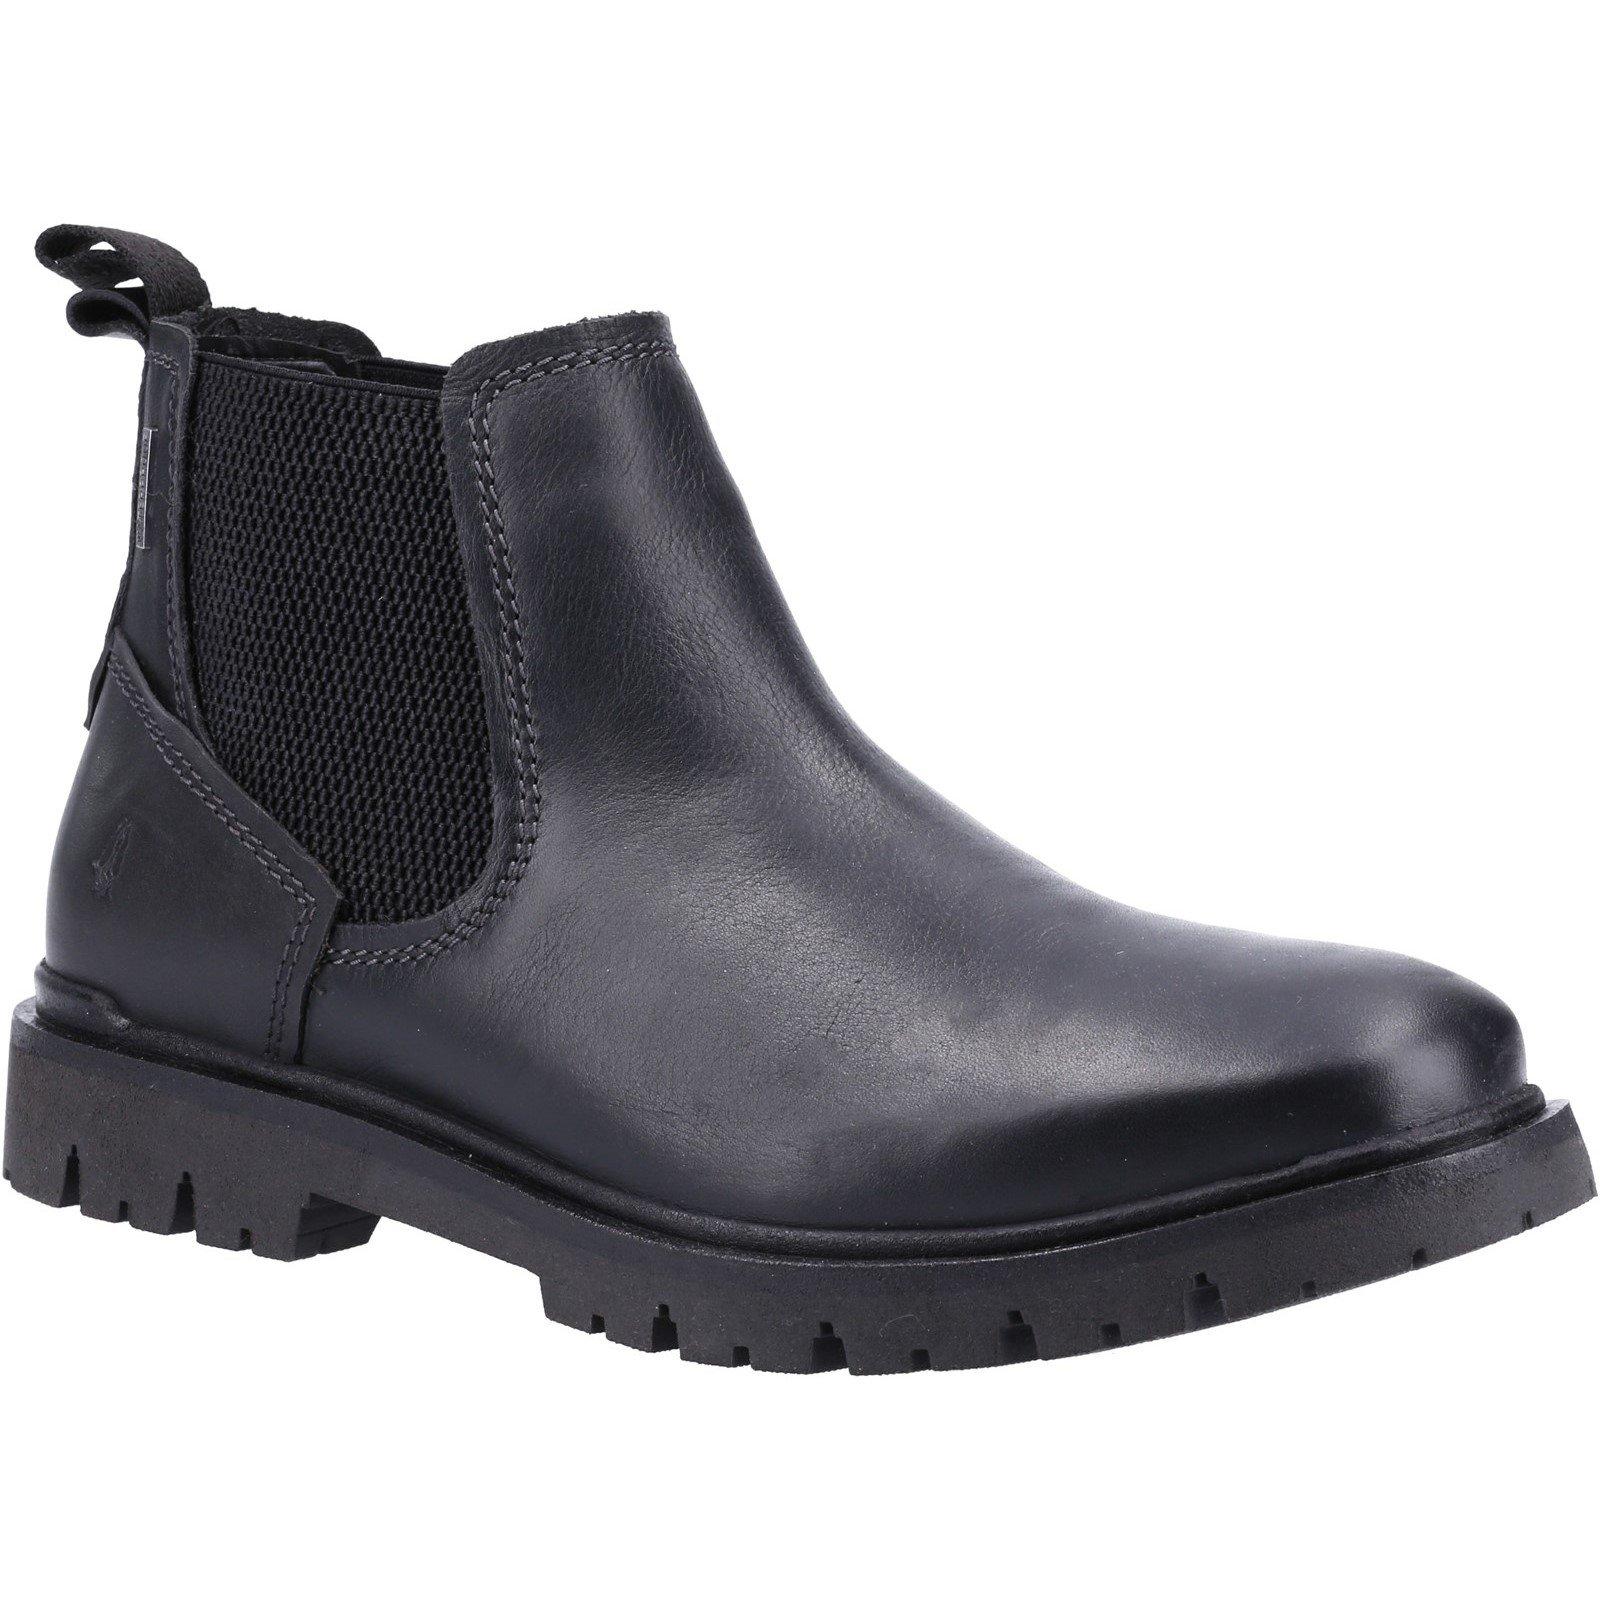 Hush Puppies Men's Paxton Chelsea Boot Various Colours 32882 - Black 7